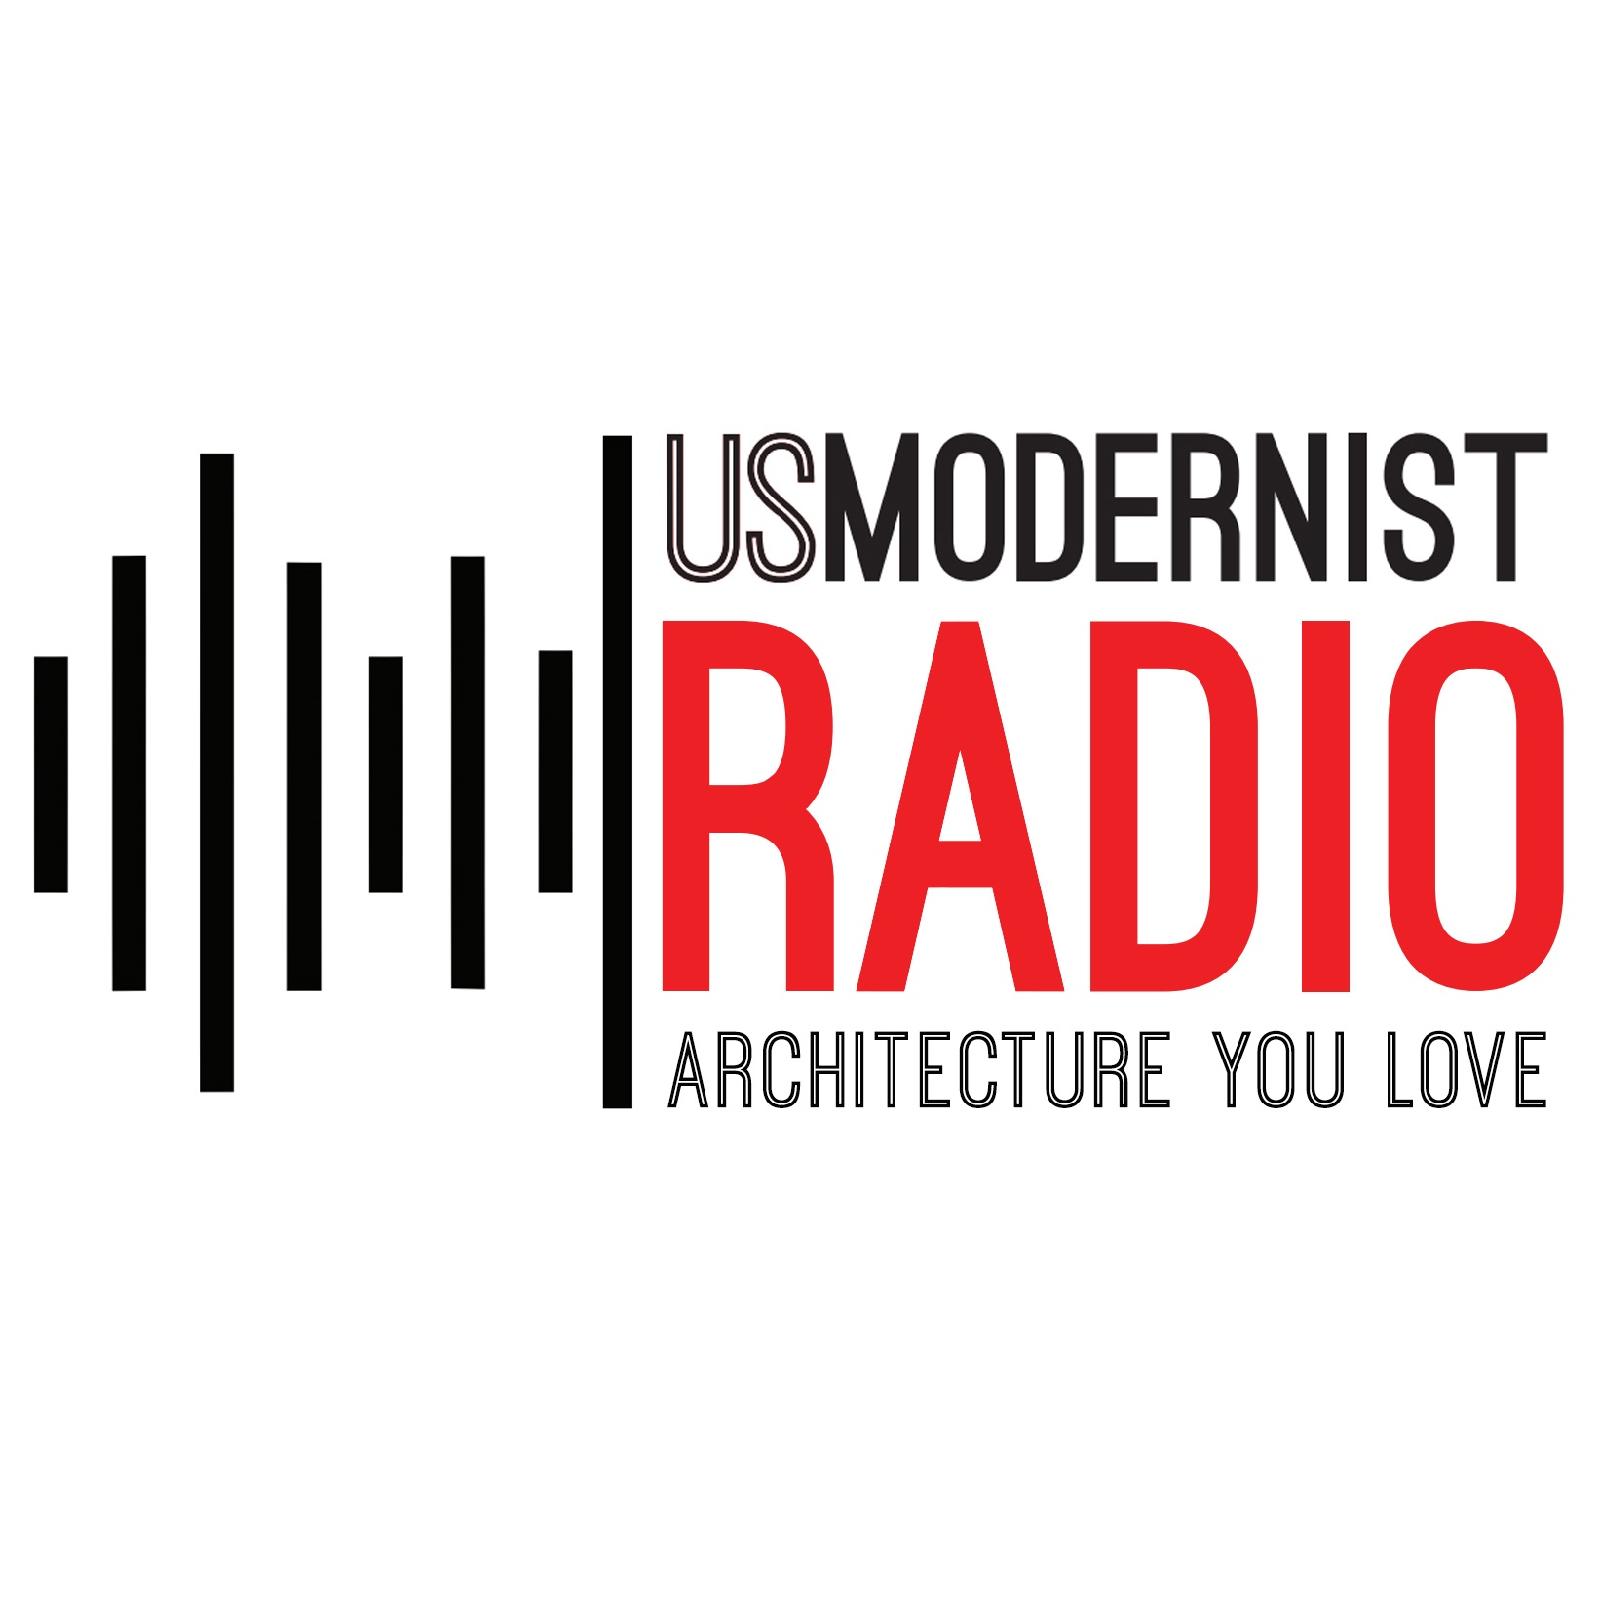 US Modernist Radio - Architecture You Love show art